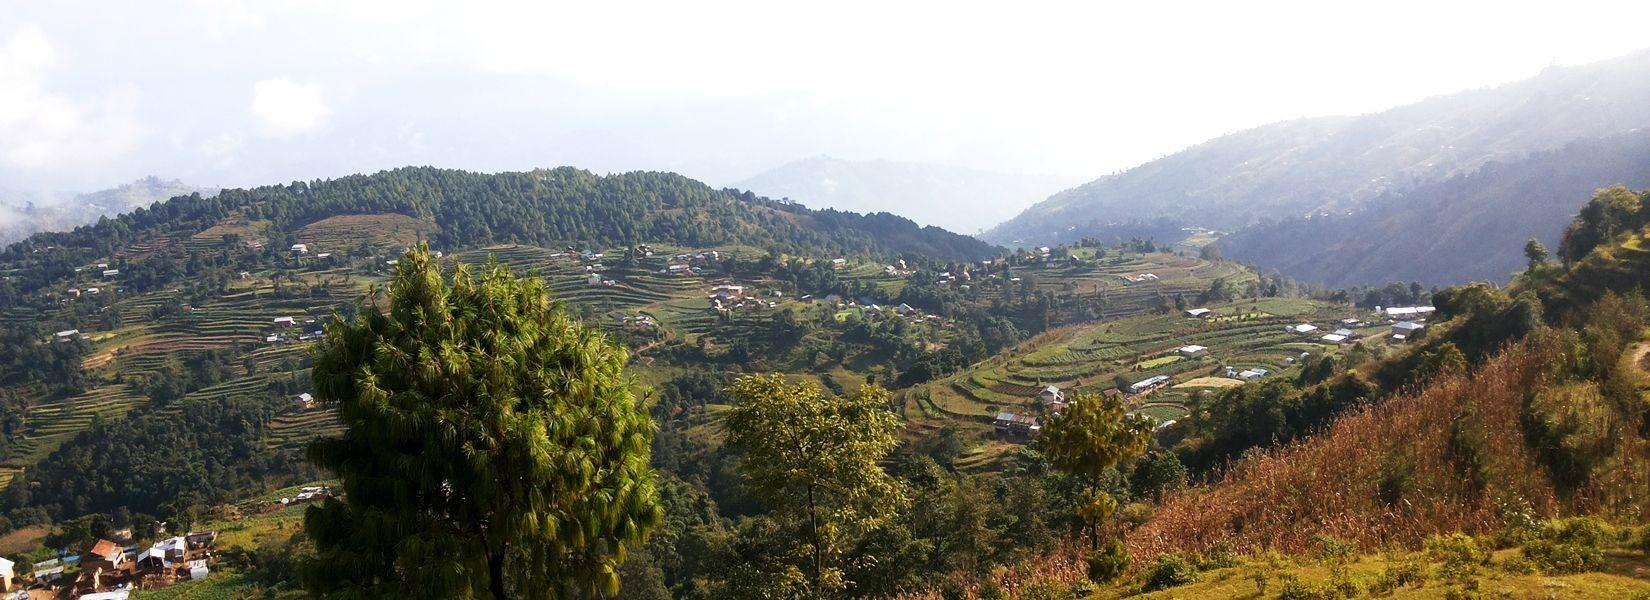 Chisapani Village, Chisapani Trek, Short Trek to Chisapani